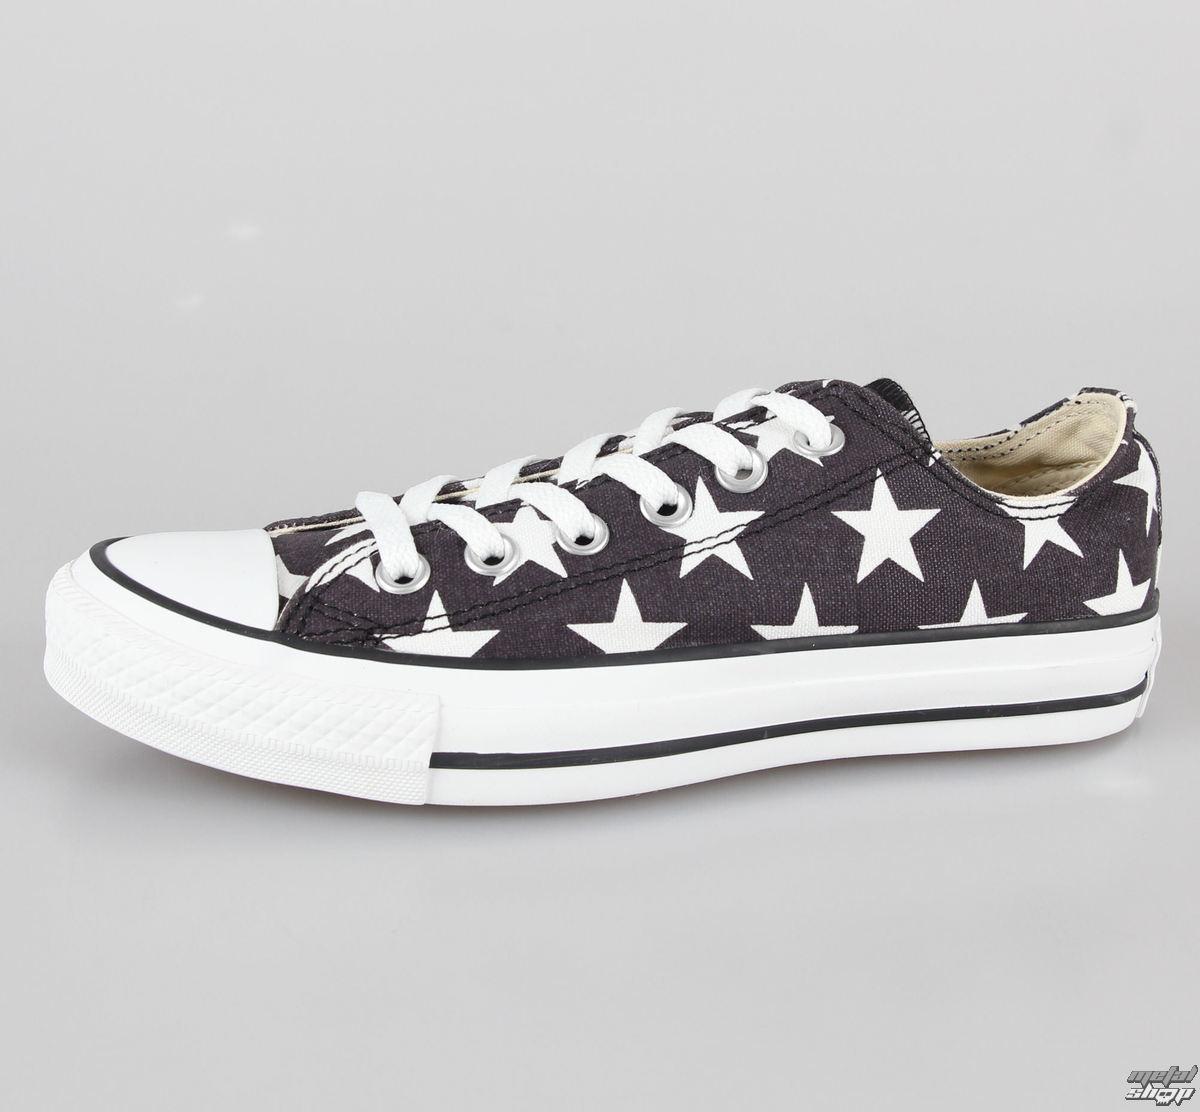 boty dámské CONVERSE - Chuck Taylor All Star - CT OX Black/White - C136613